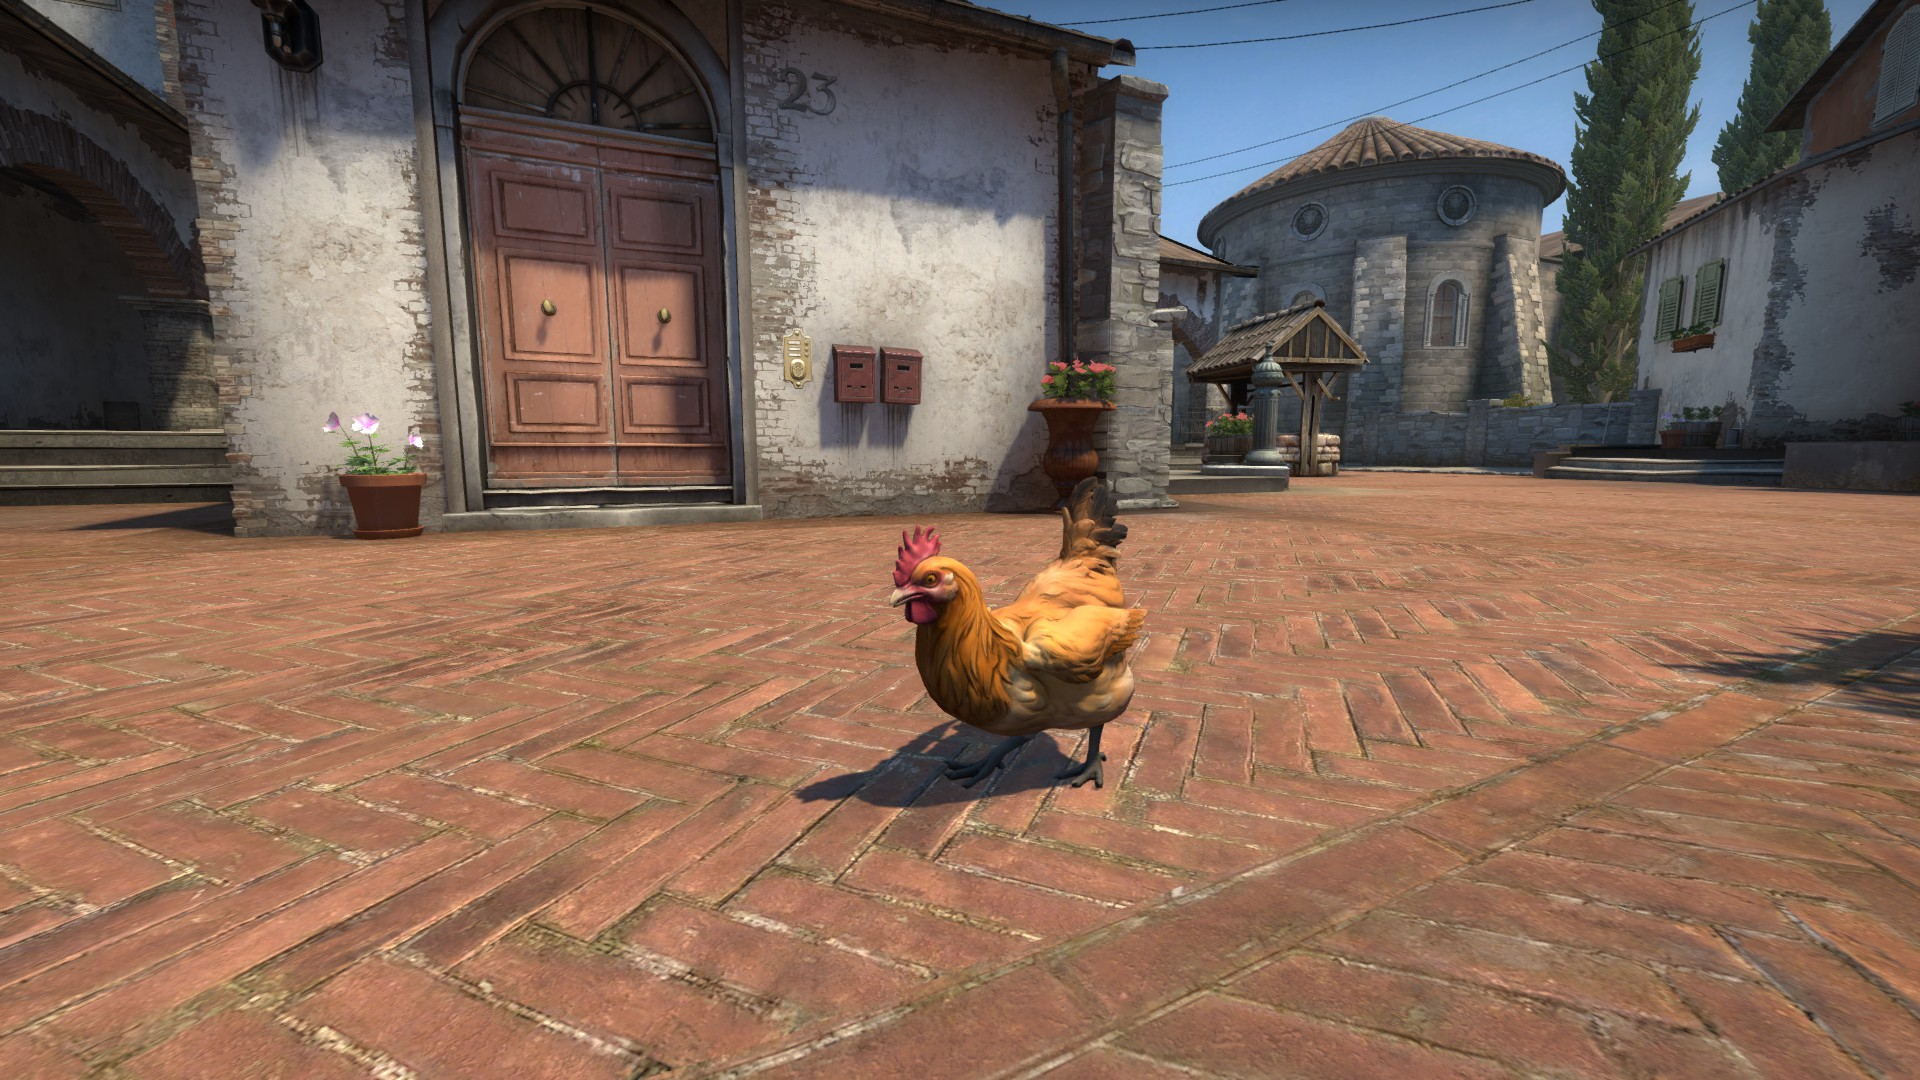 cs go chickens